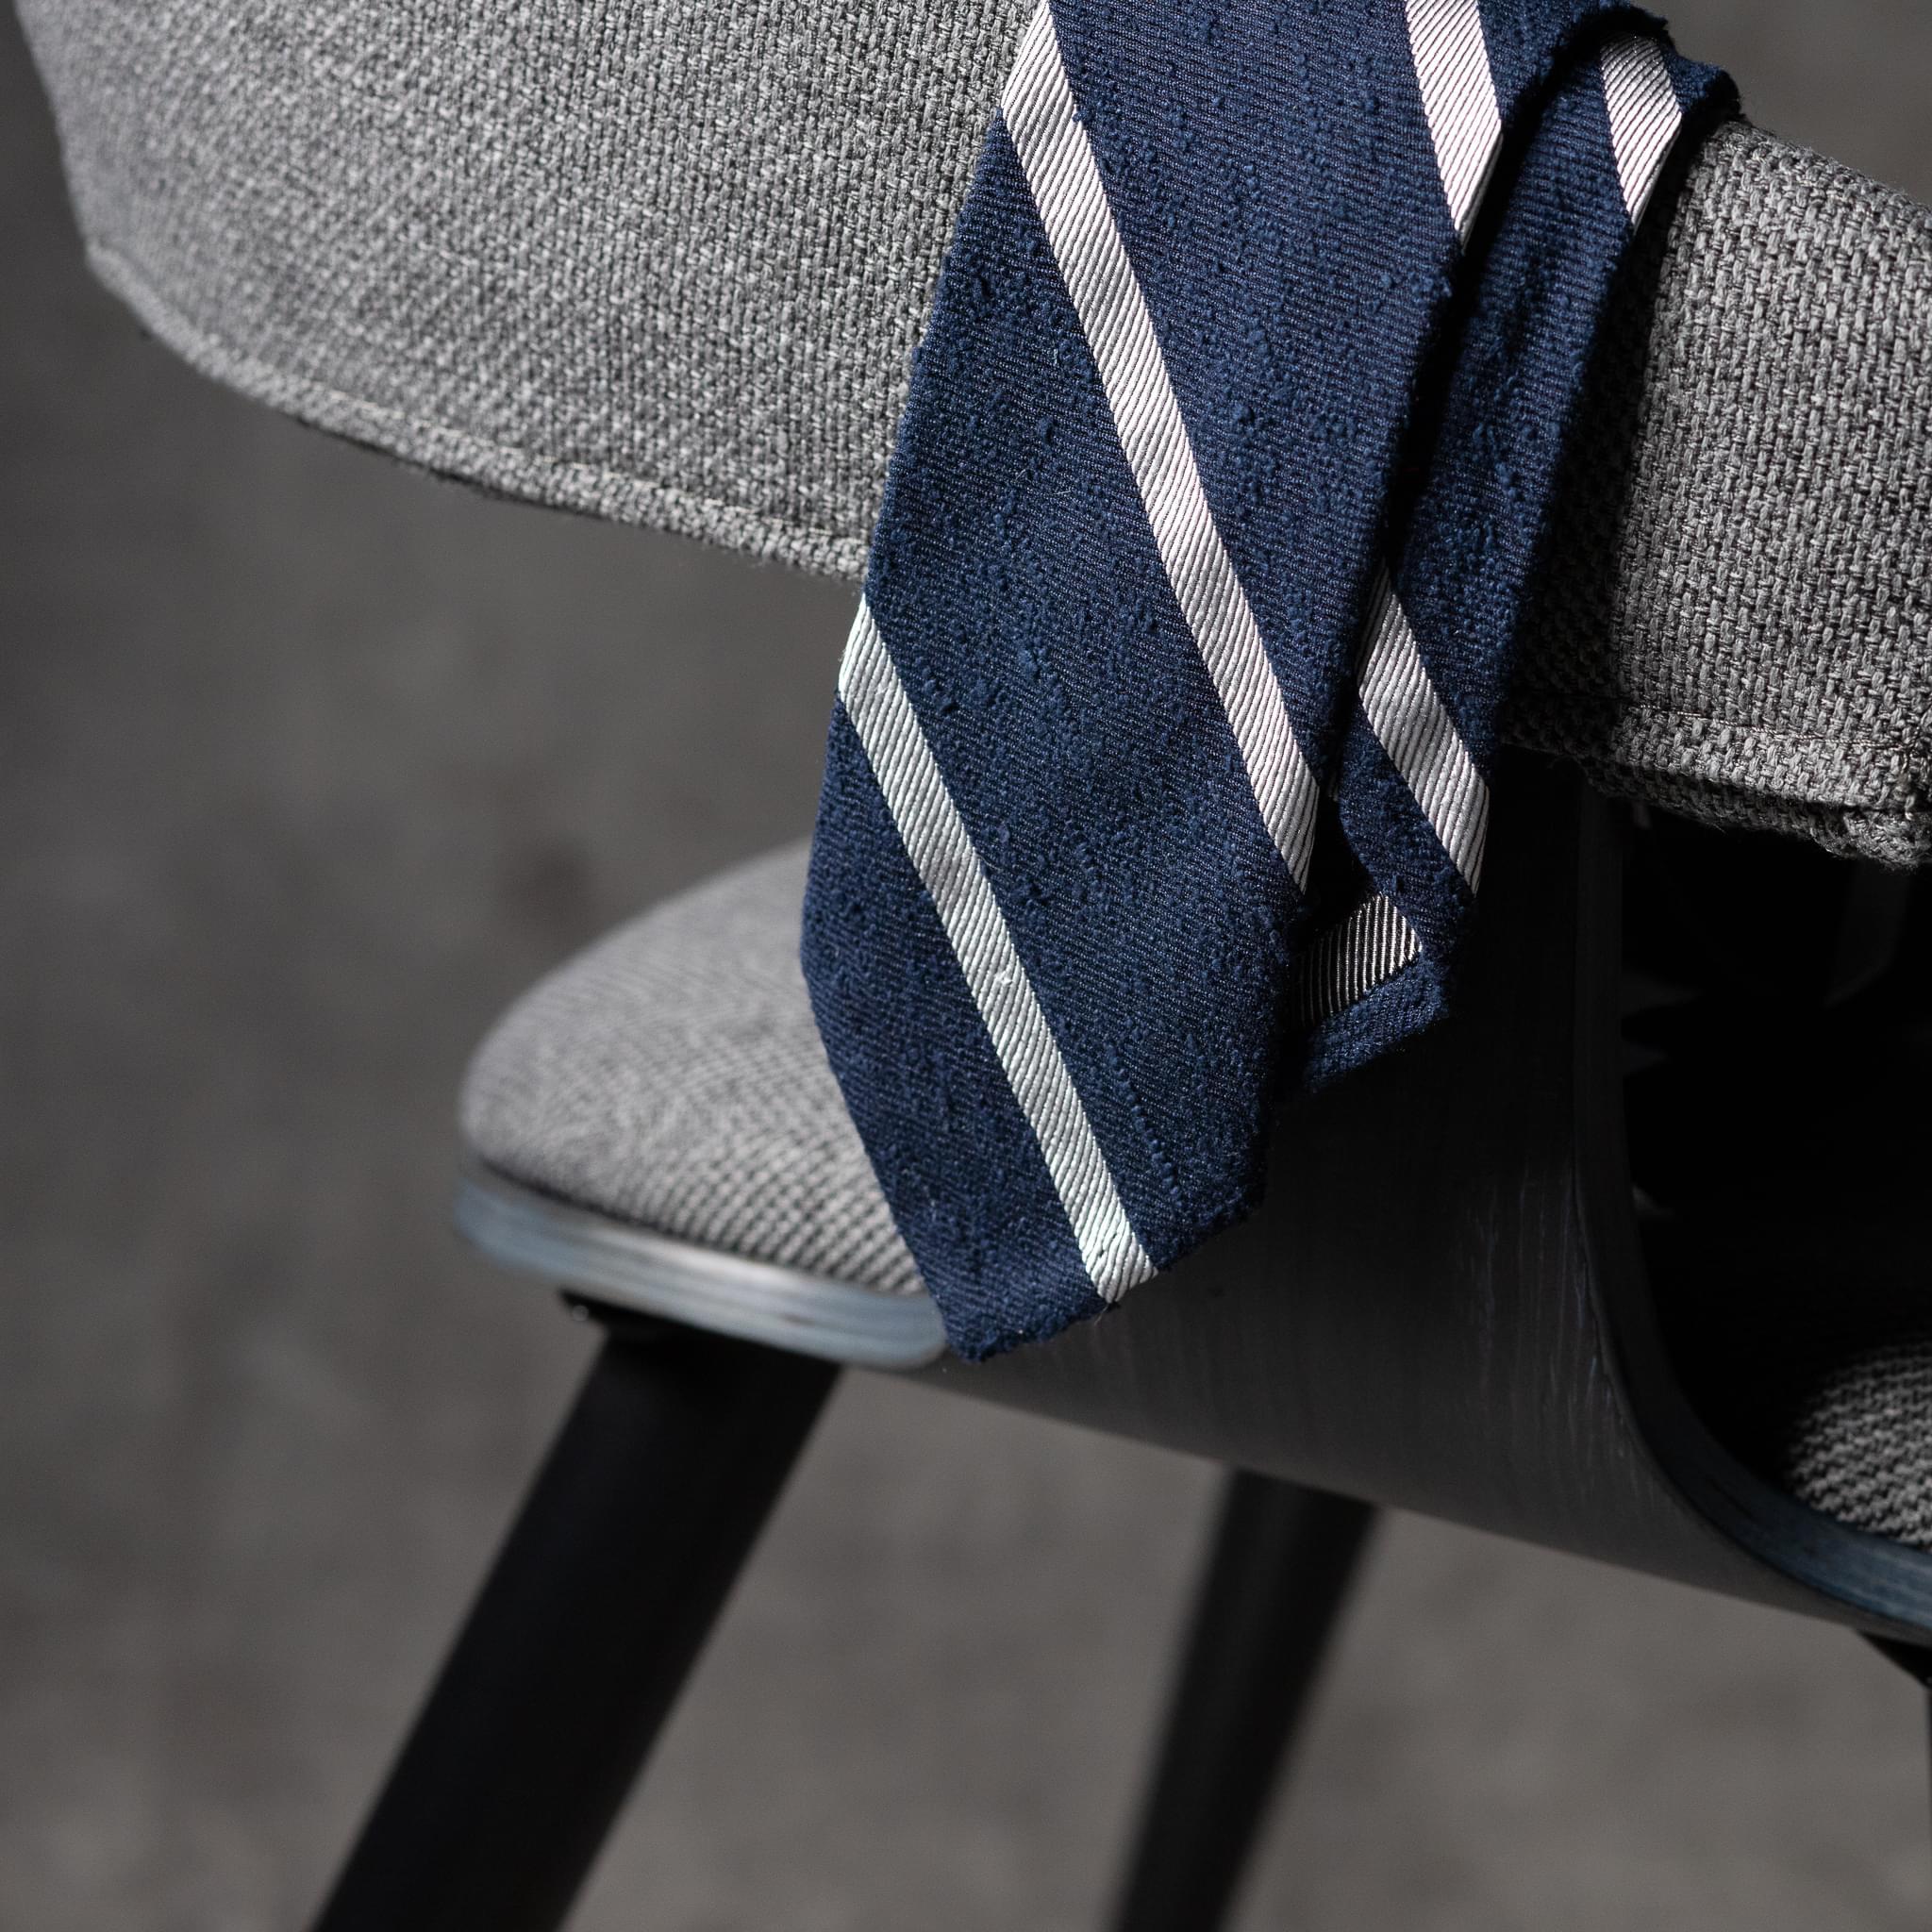 SHANTUNG-0361-Tie-Initials-Corbata-Iniciales-The-Seelk-2